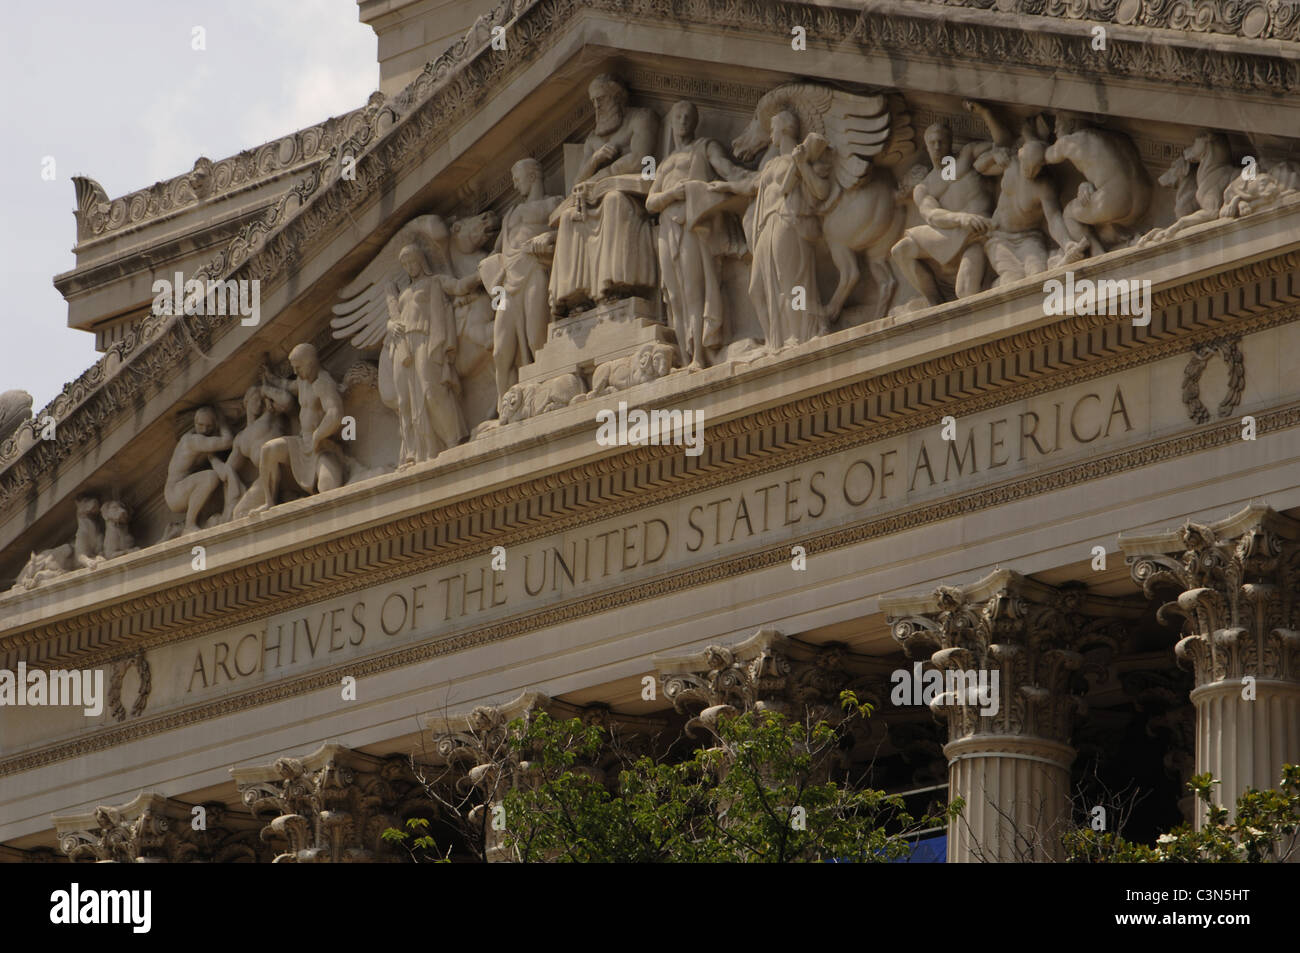 National Archives Building. Exterior detail. Washington D.C. United States. - Stock Image